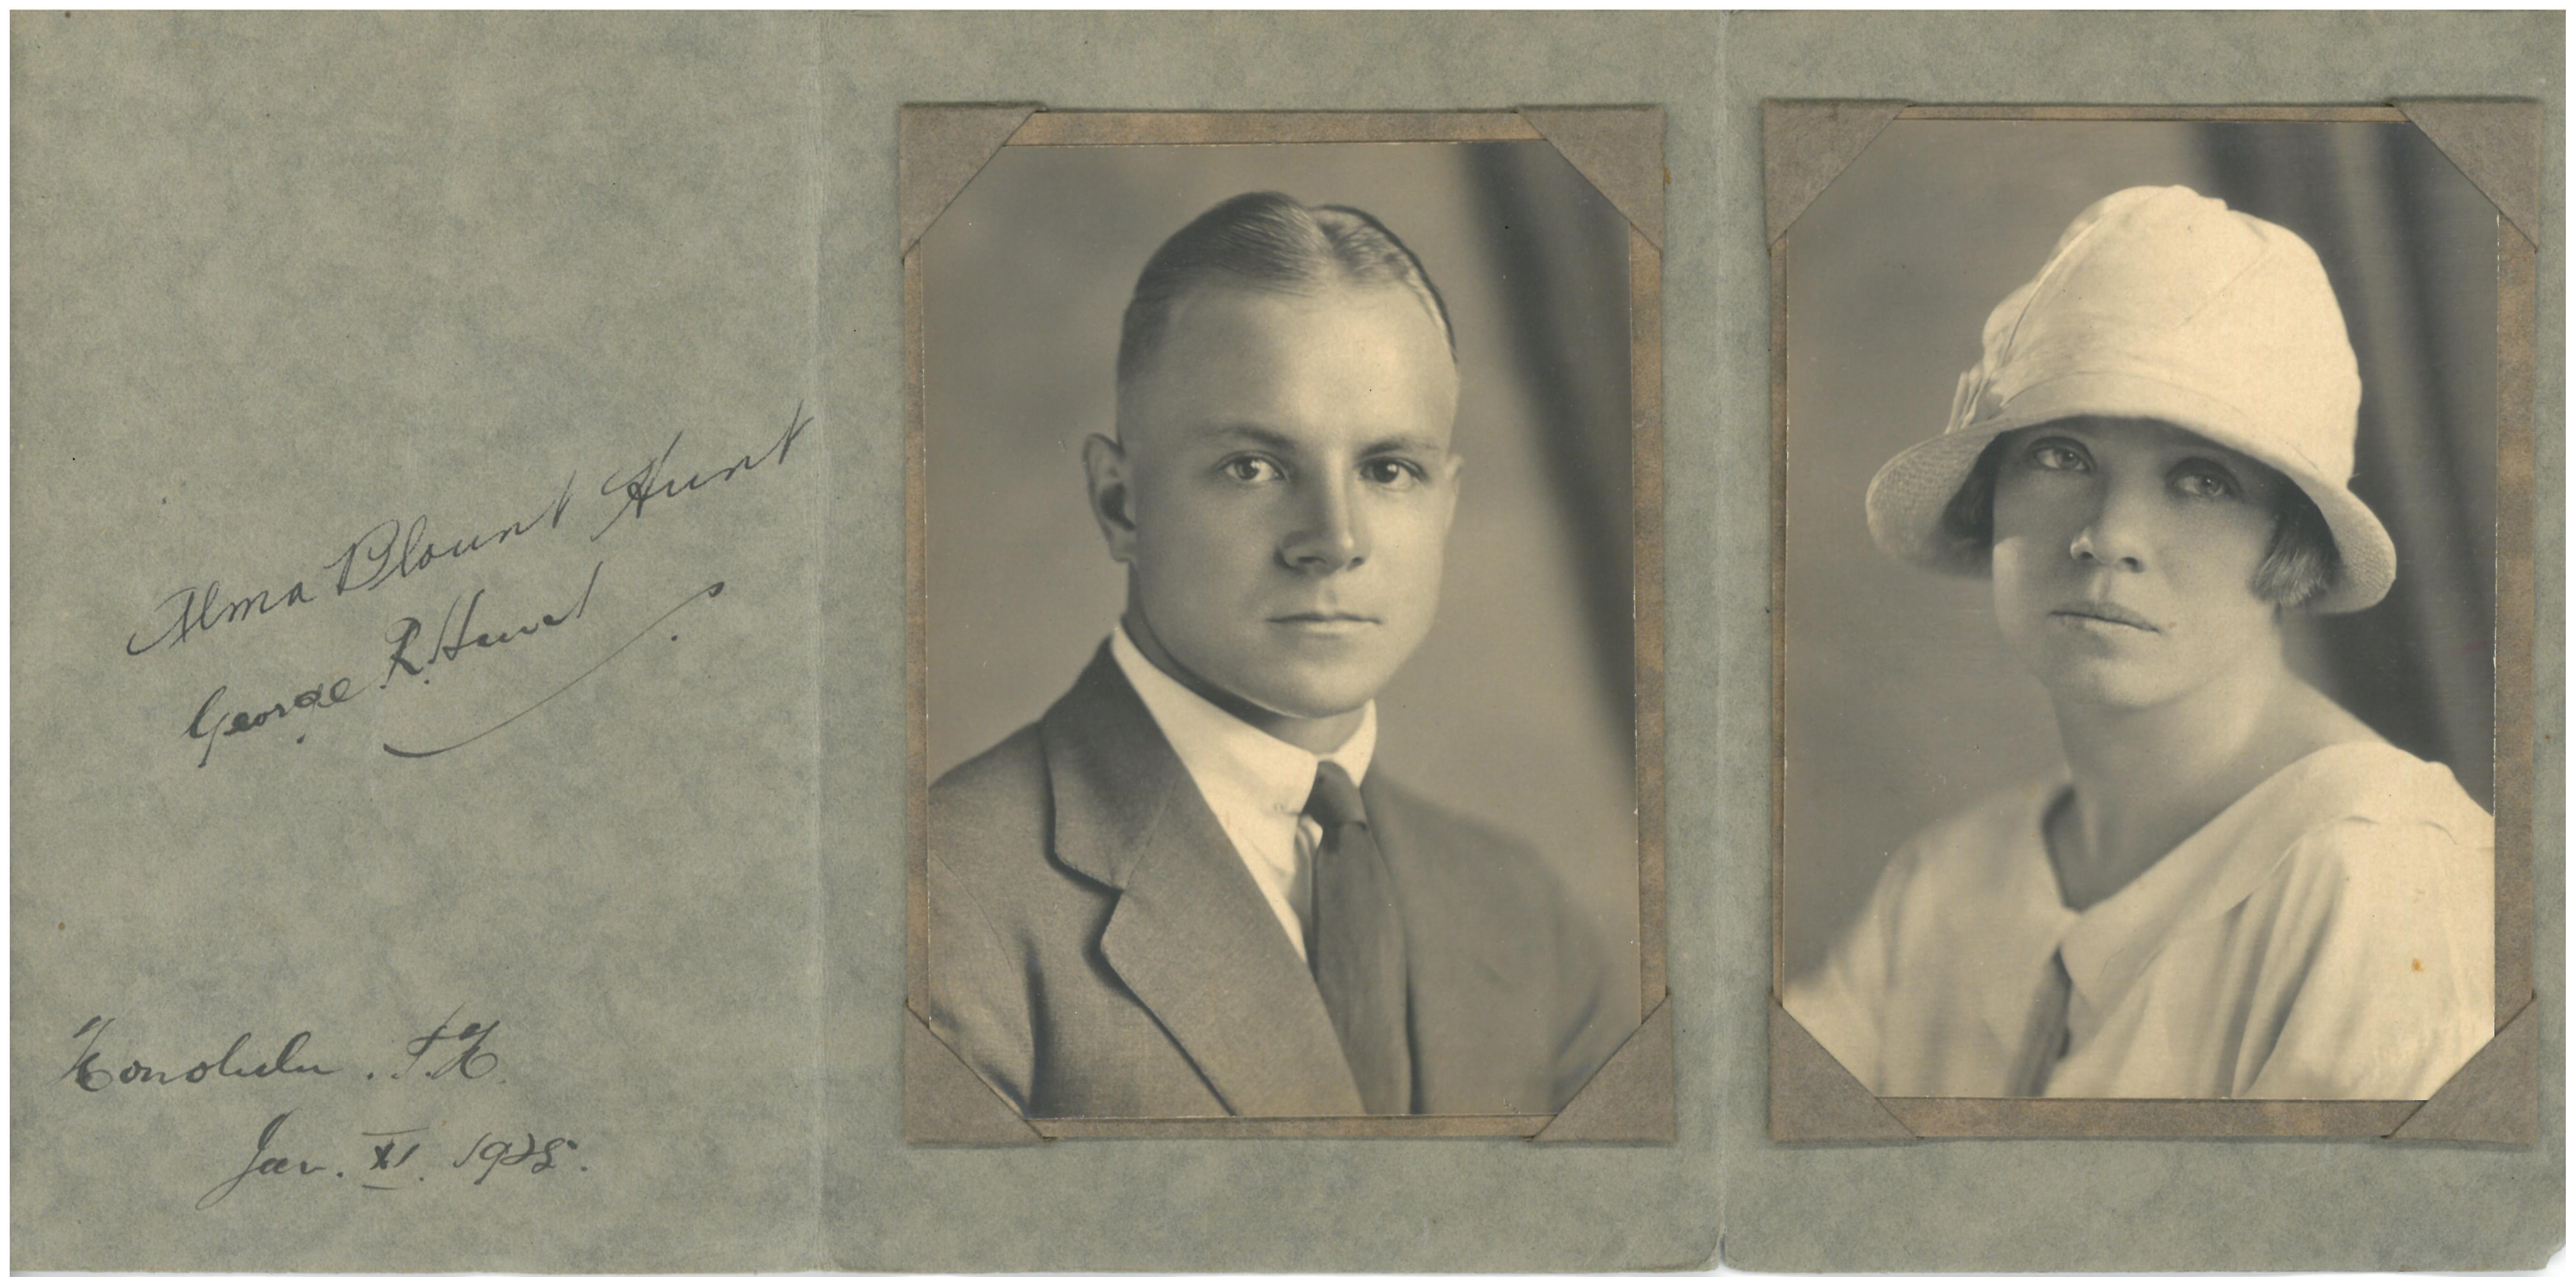 Alma Blount and George Hunt 1925